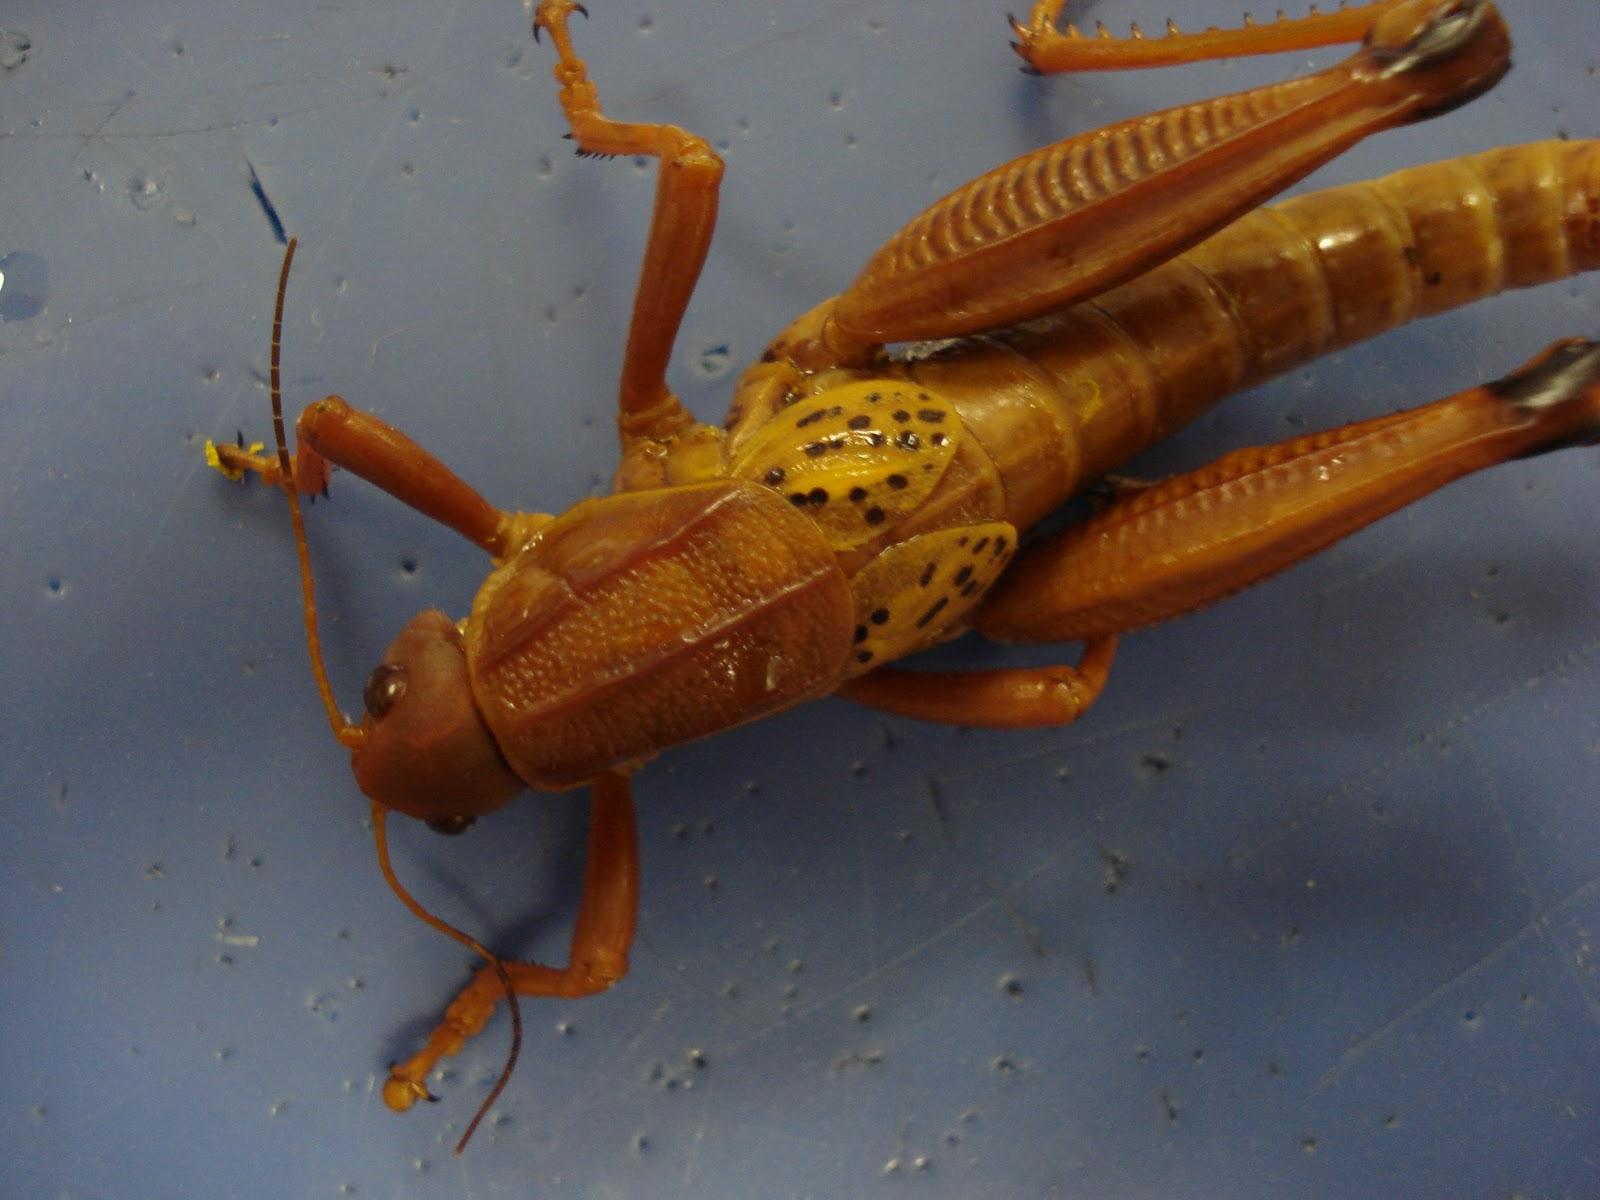 Rebekah S Dissection Log Land Lubber Grasshopper Dissection